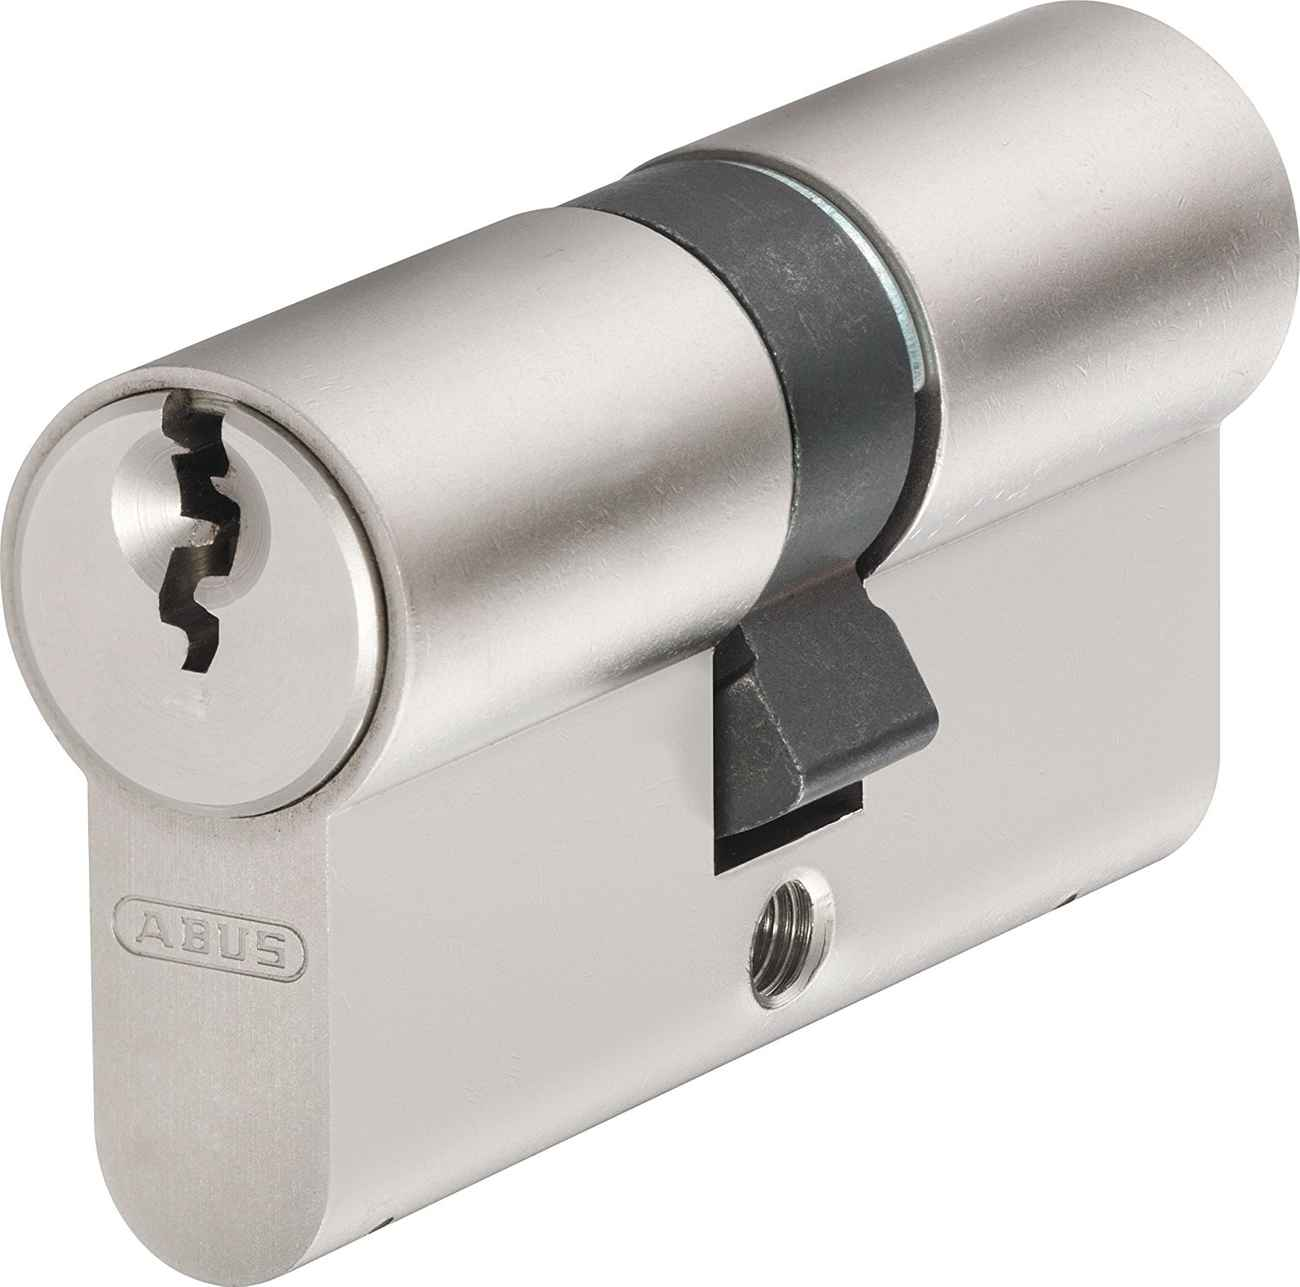 Abus Profilzylinder D6X 30/30 mm, 5 Schlüssel, Codekarte